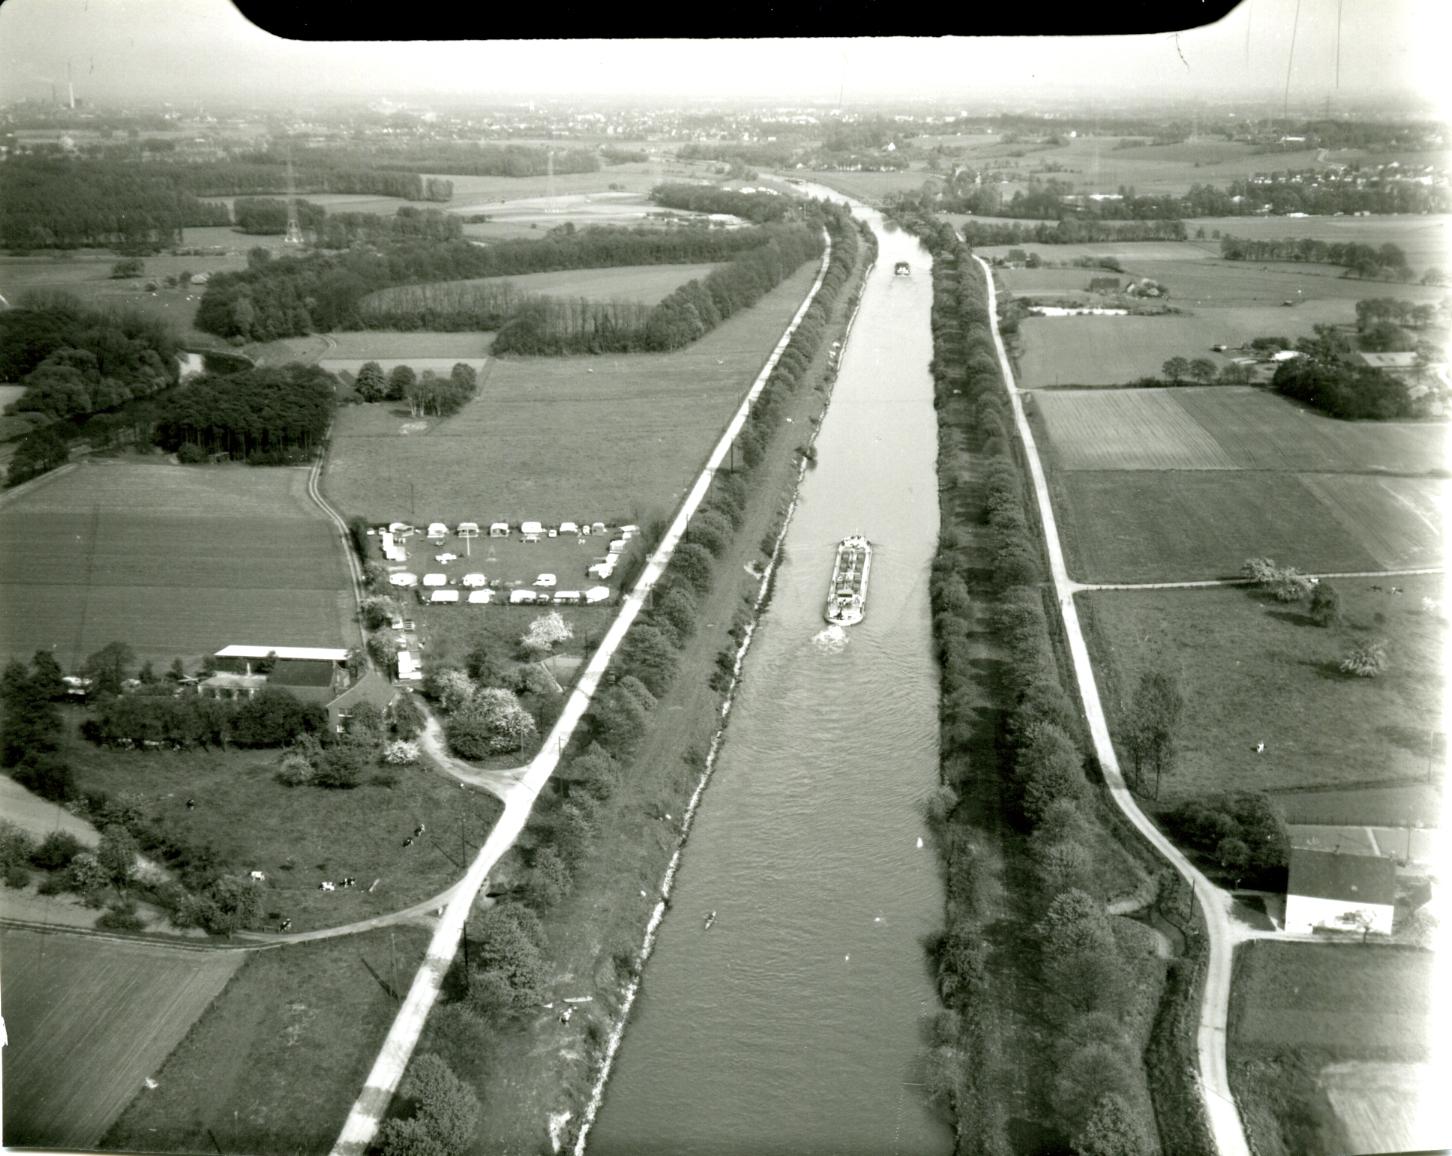 Gahlen-Kanal